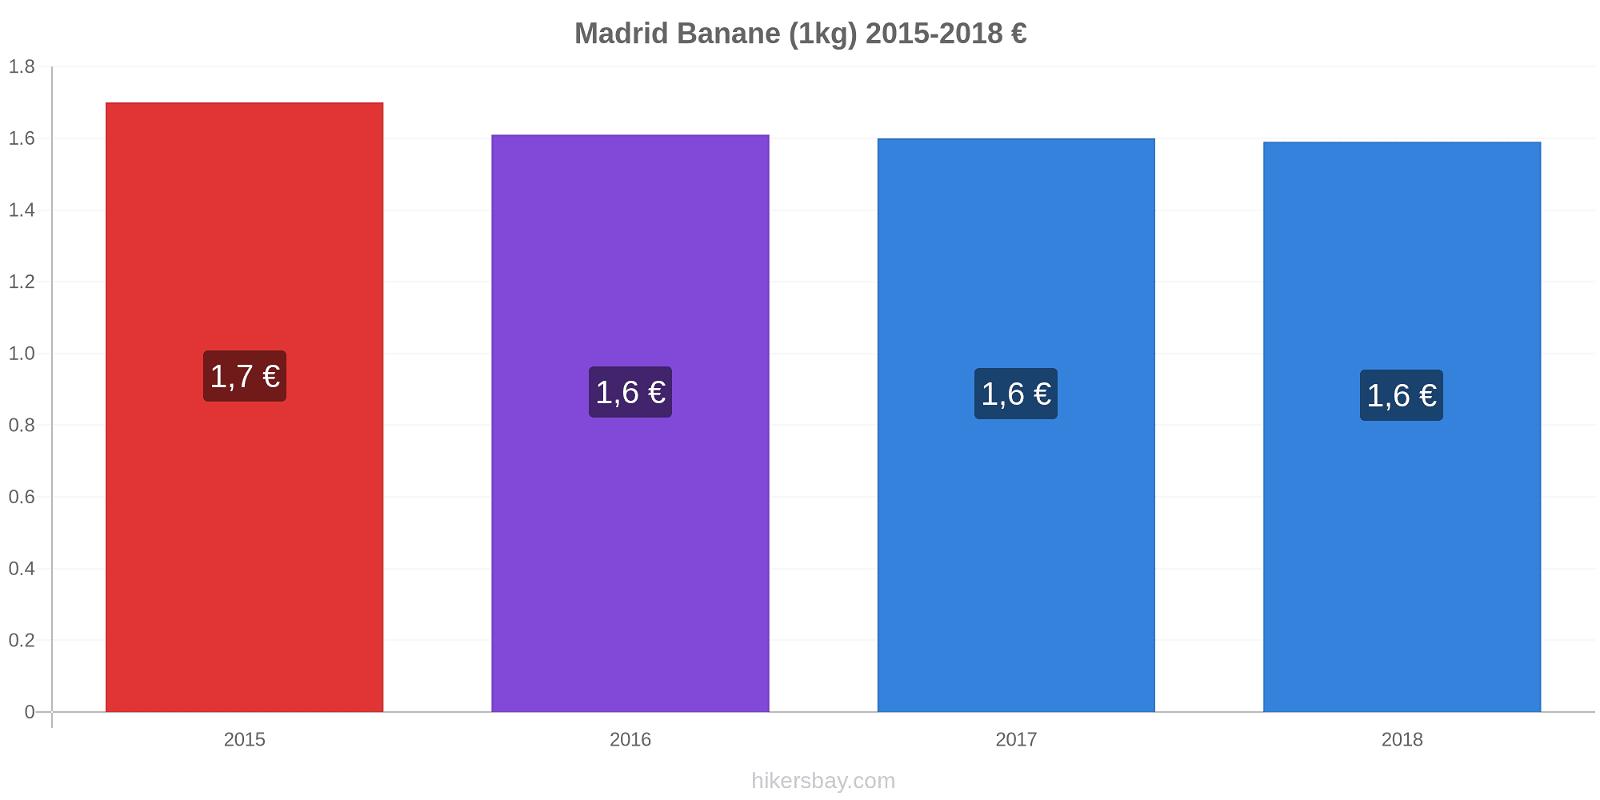 Madrid Preisänderungen Banane (1kg) hikersbay.com